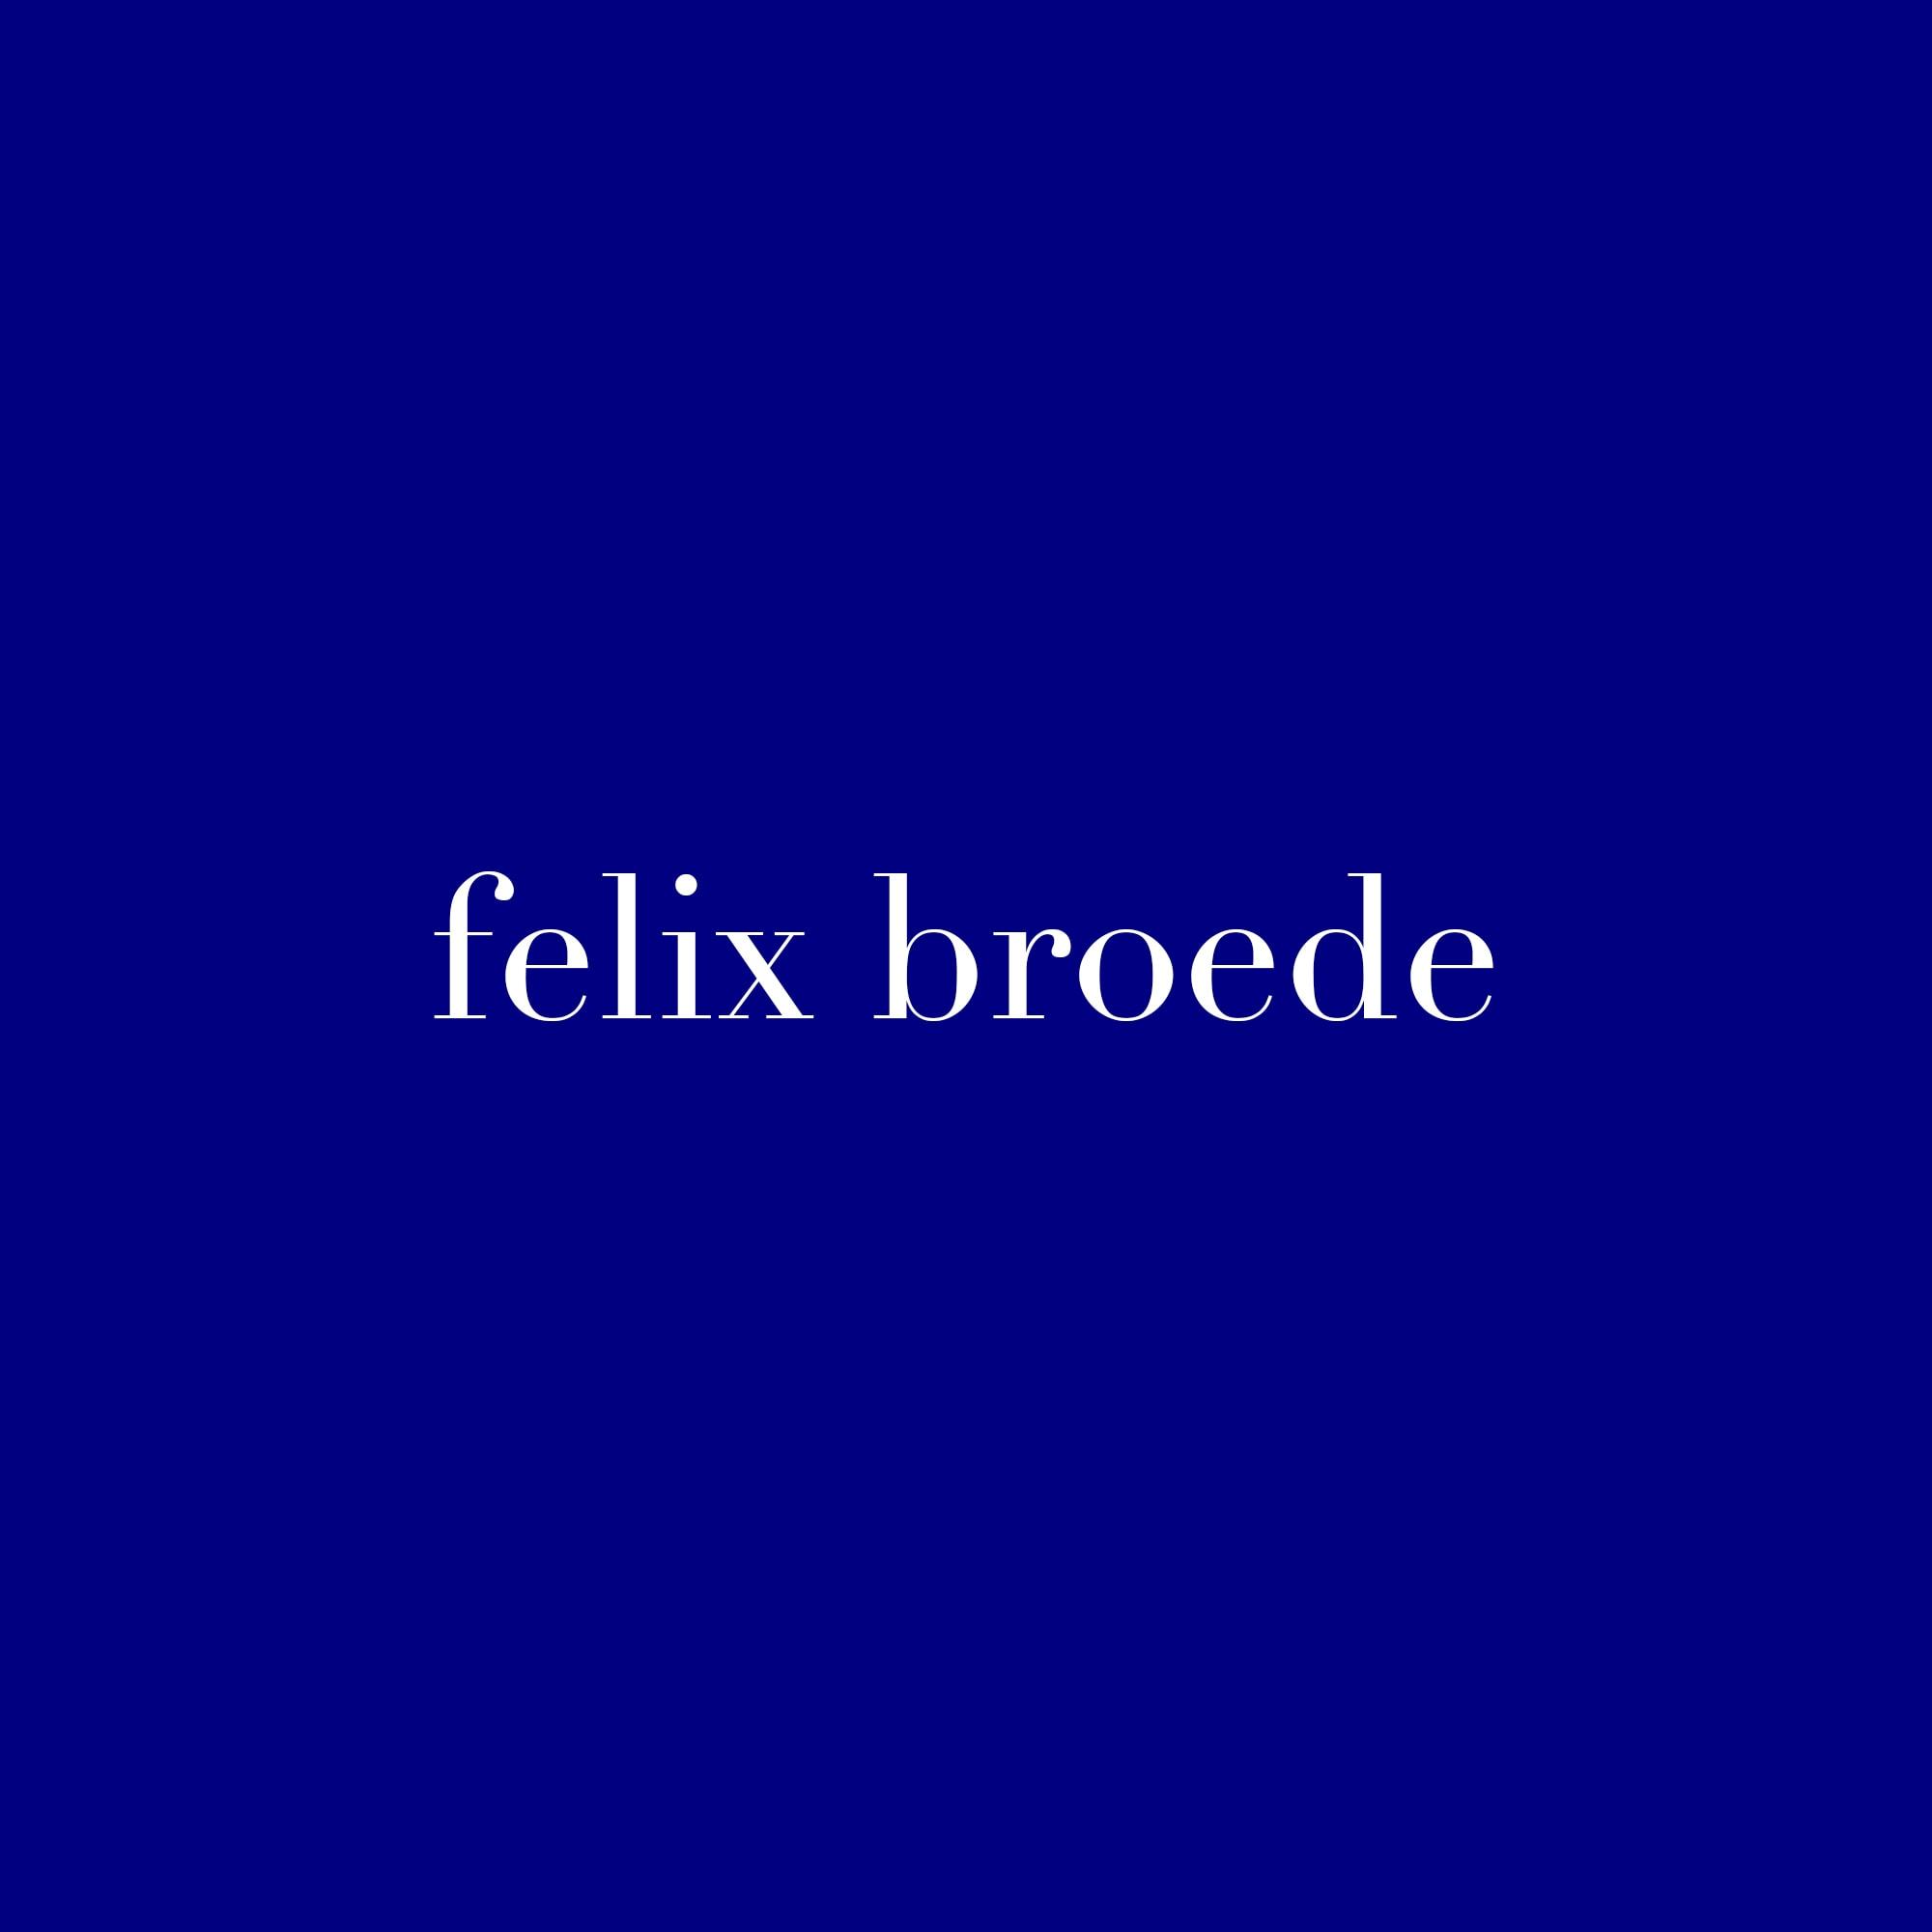 felix_broede_intro_7